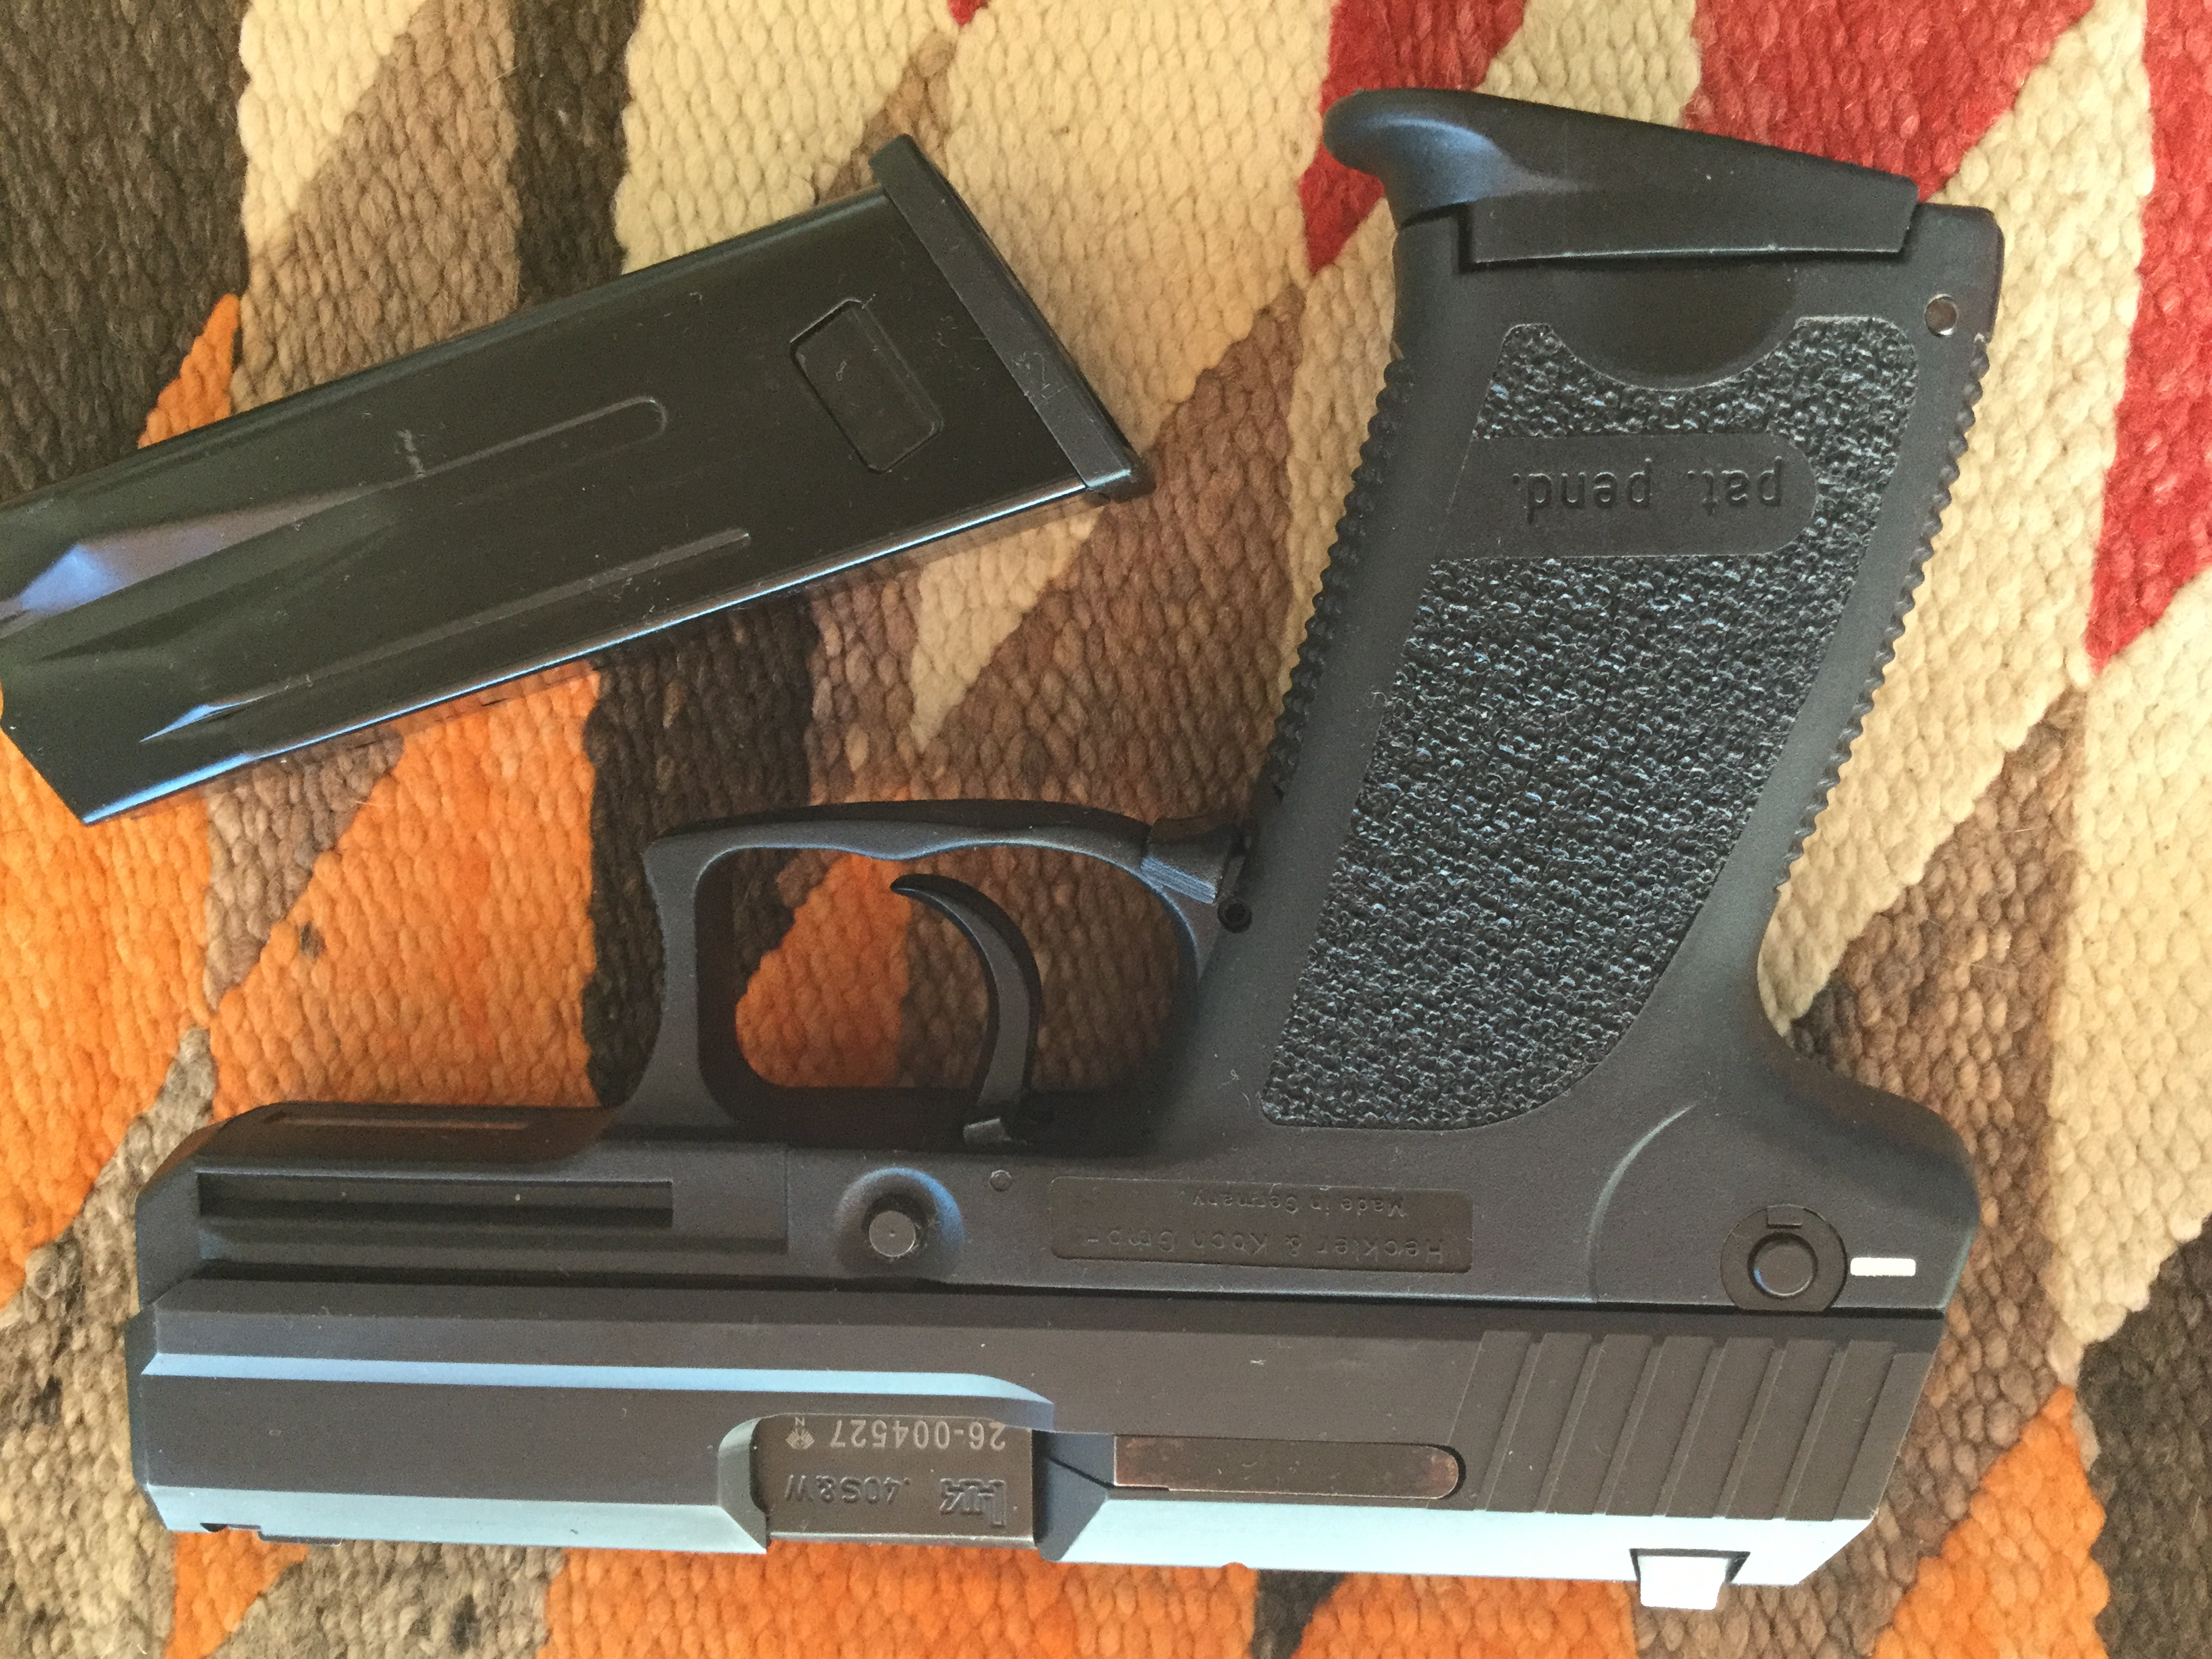 used usp .40 compact-img_1740.jpg